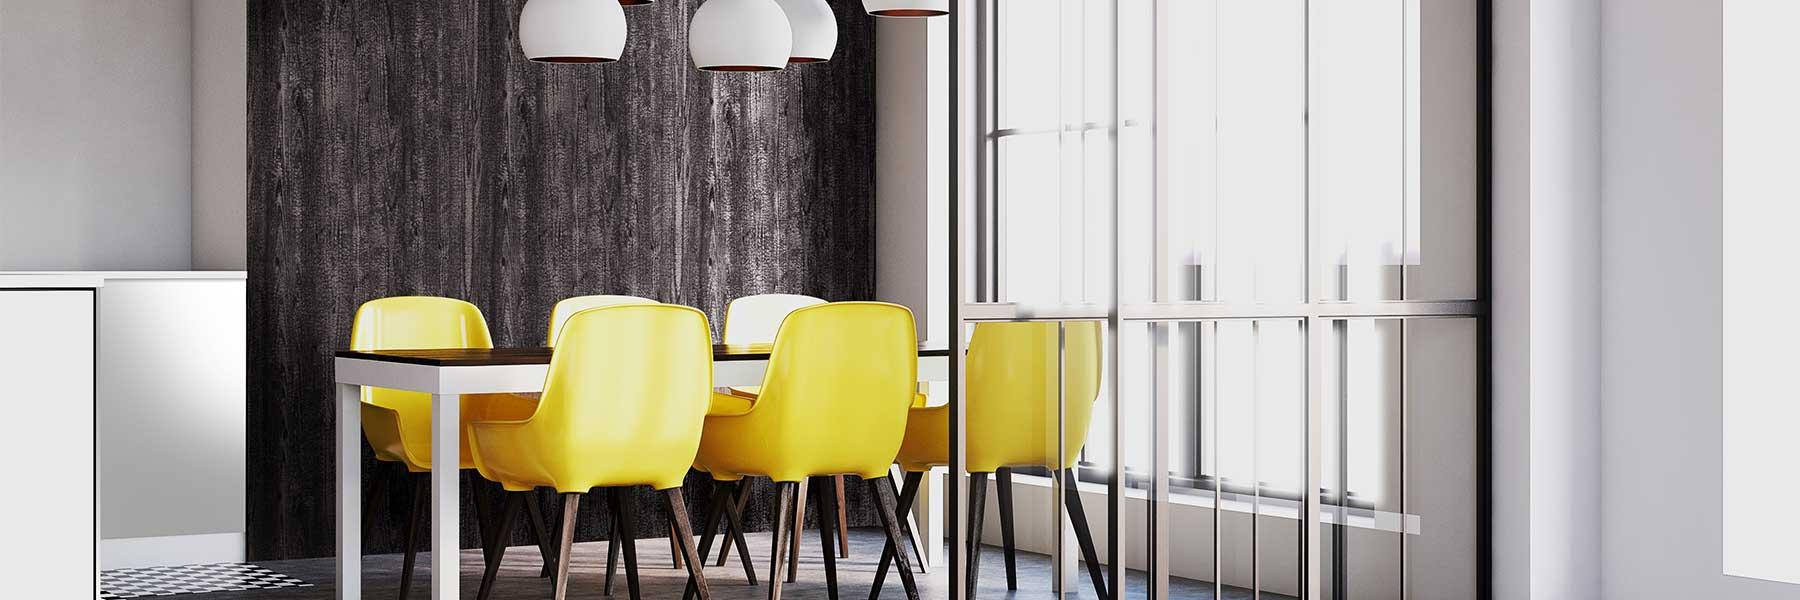 Holzdekor Kunststoffdesignplatten Holzoptik Möbelverkleidung Wandverkleidung WL Carbonized Wood Antigrav